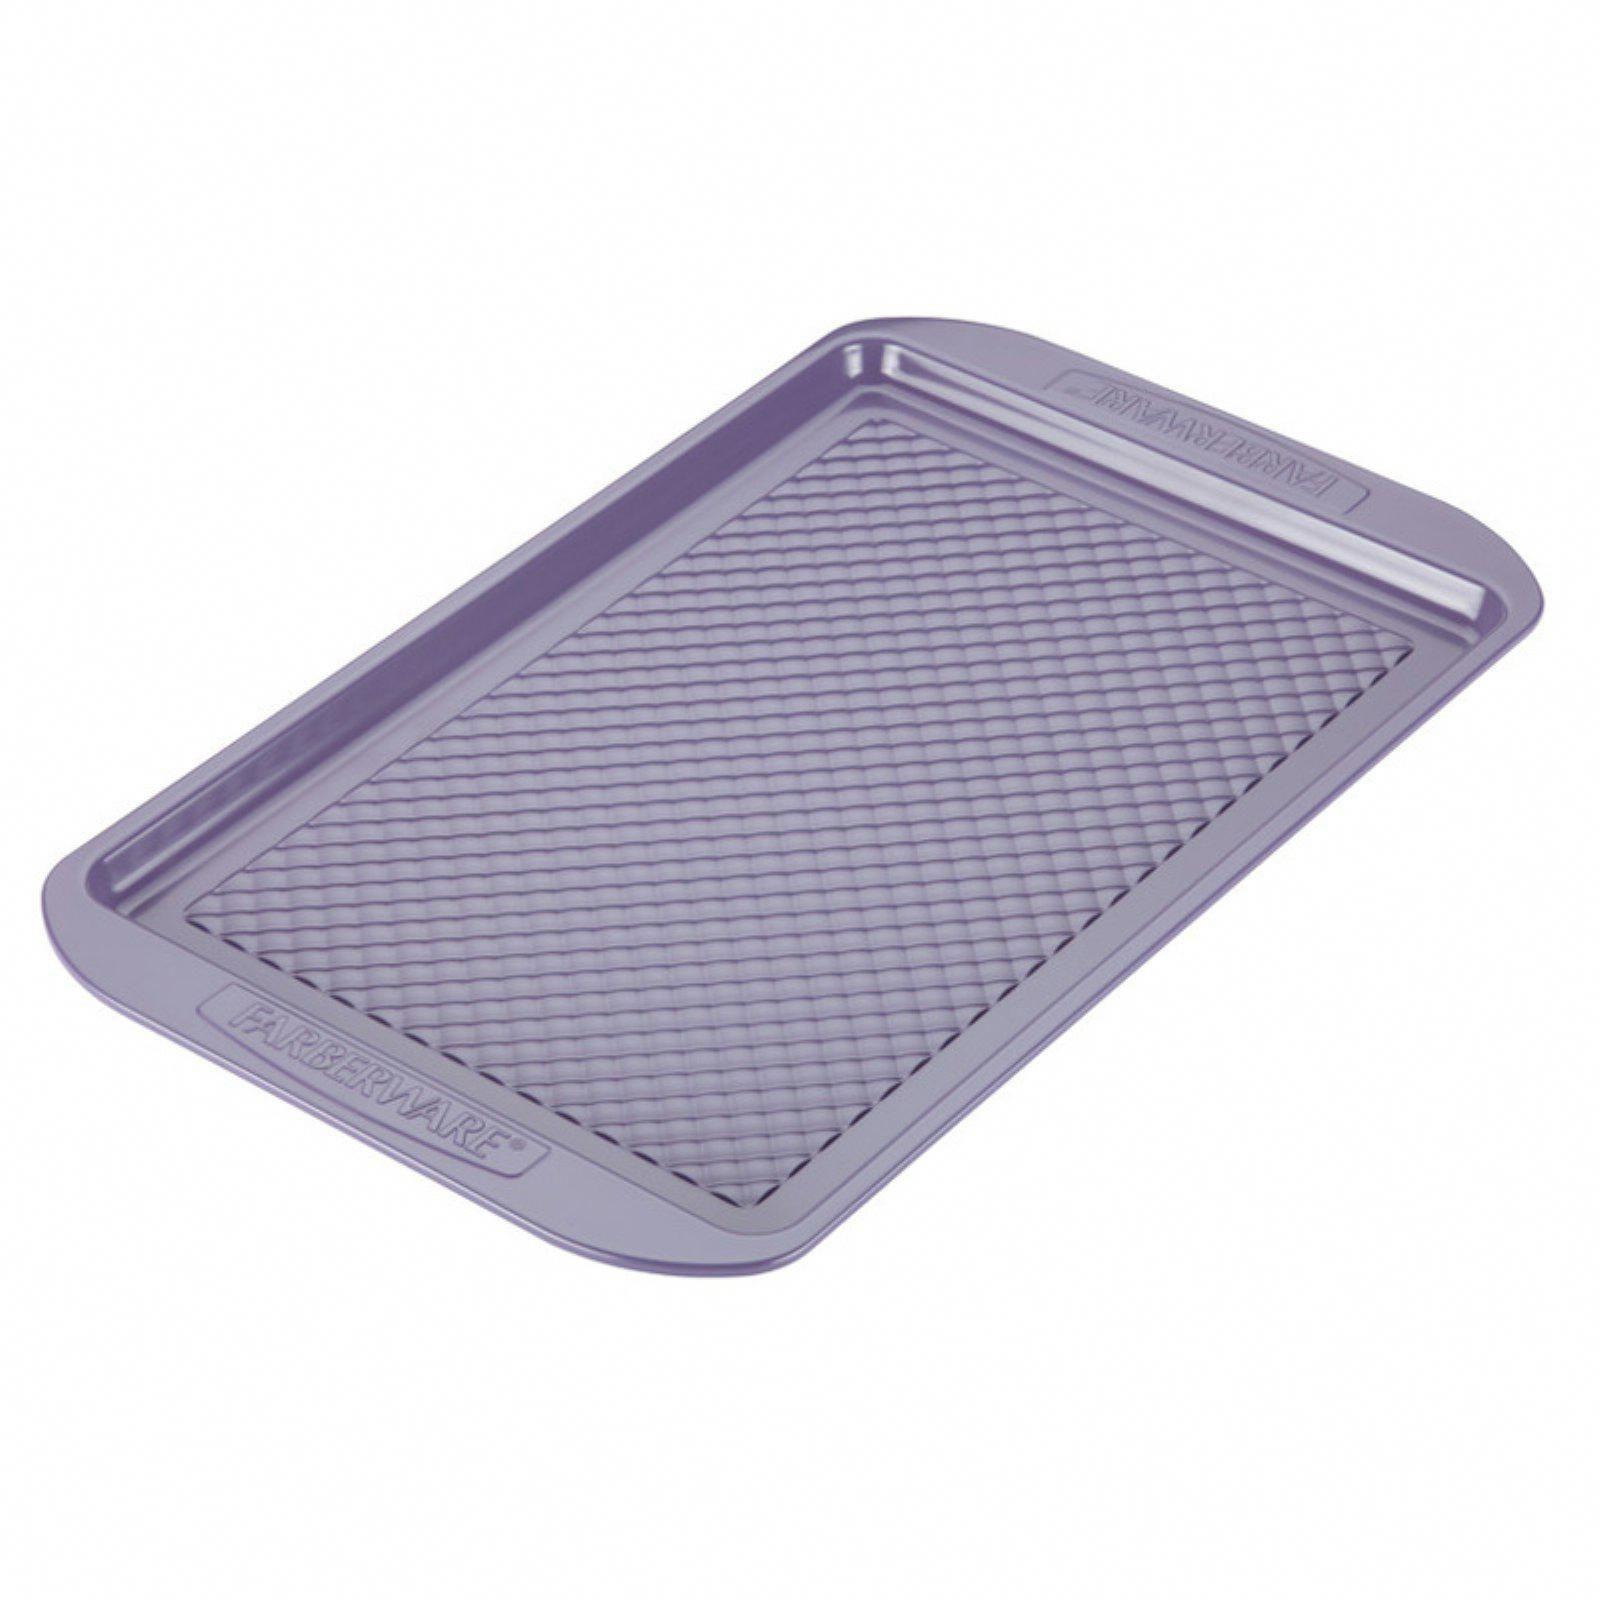 Farberware purecook baking sheet and cookie pan